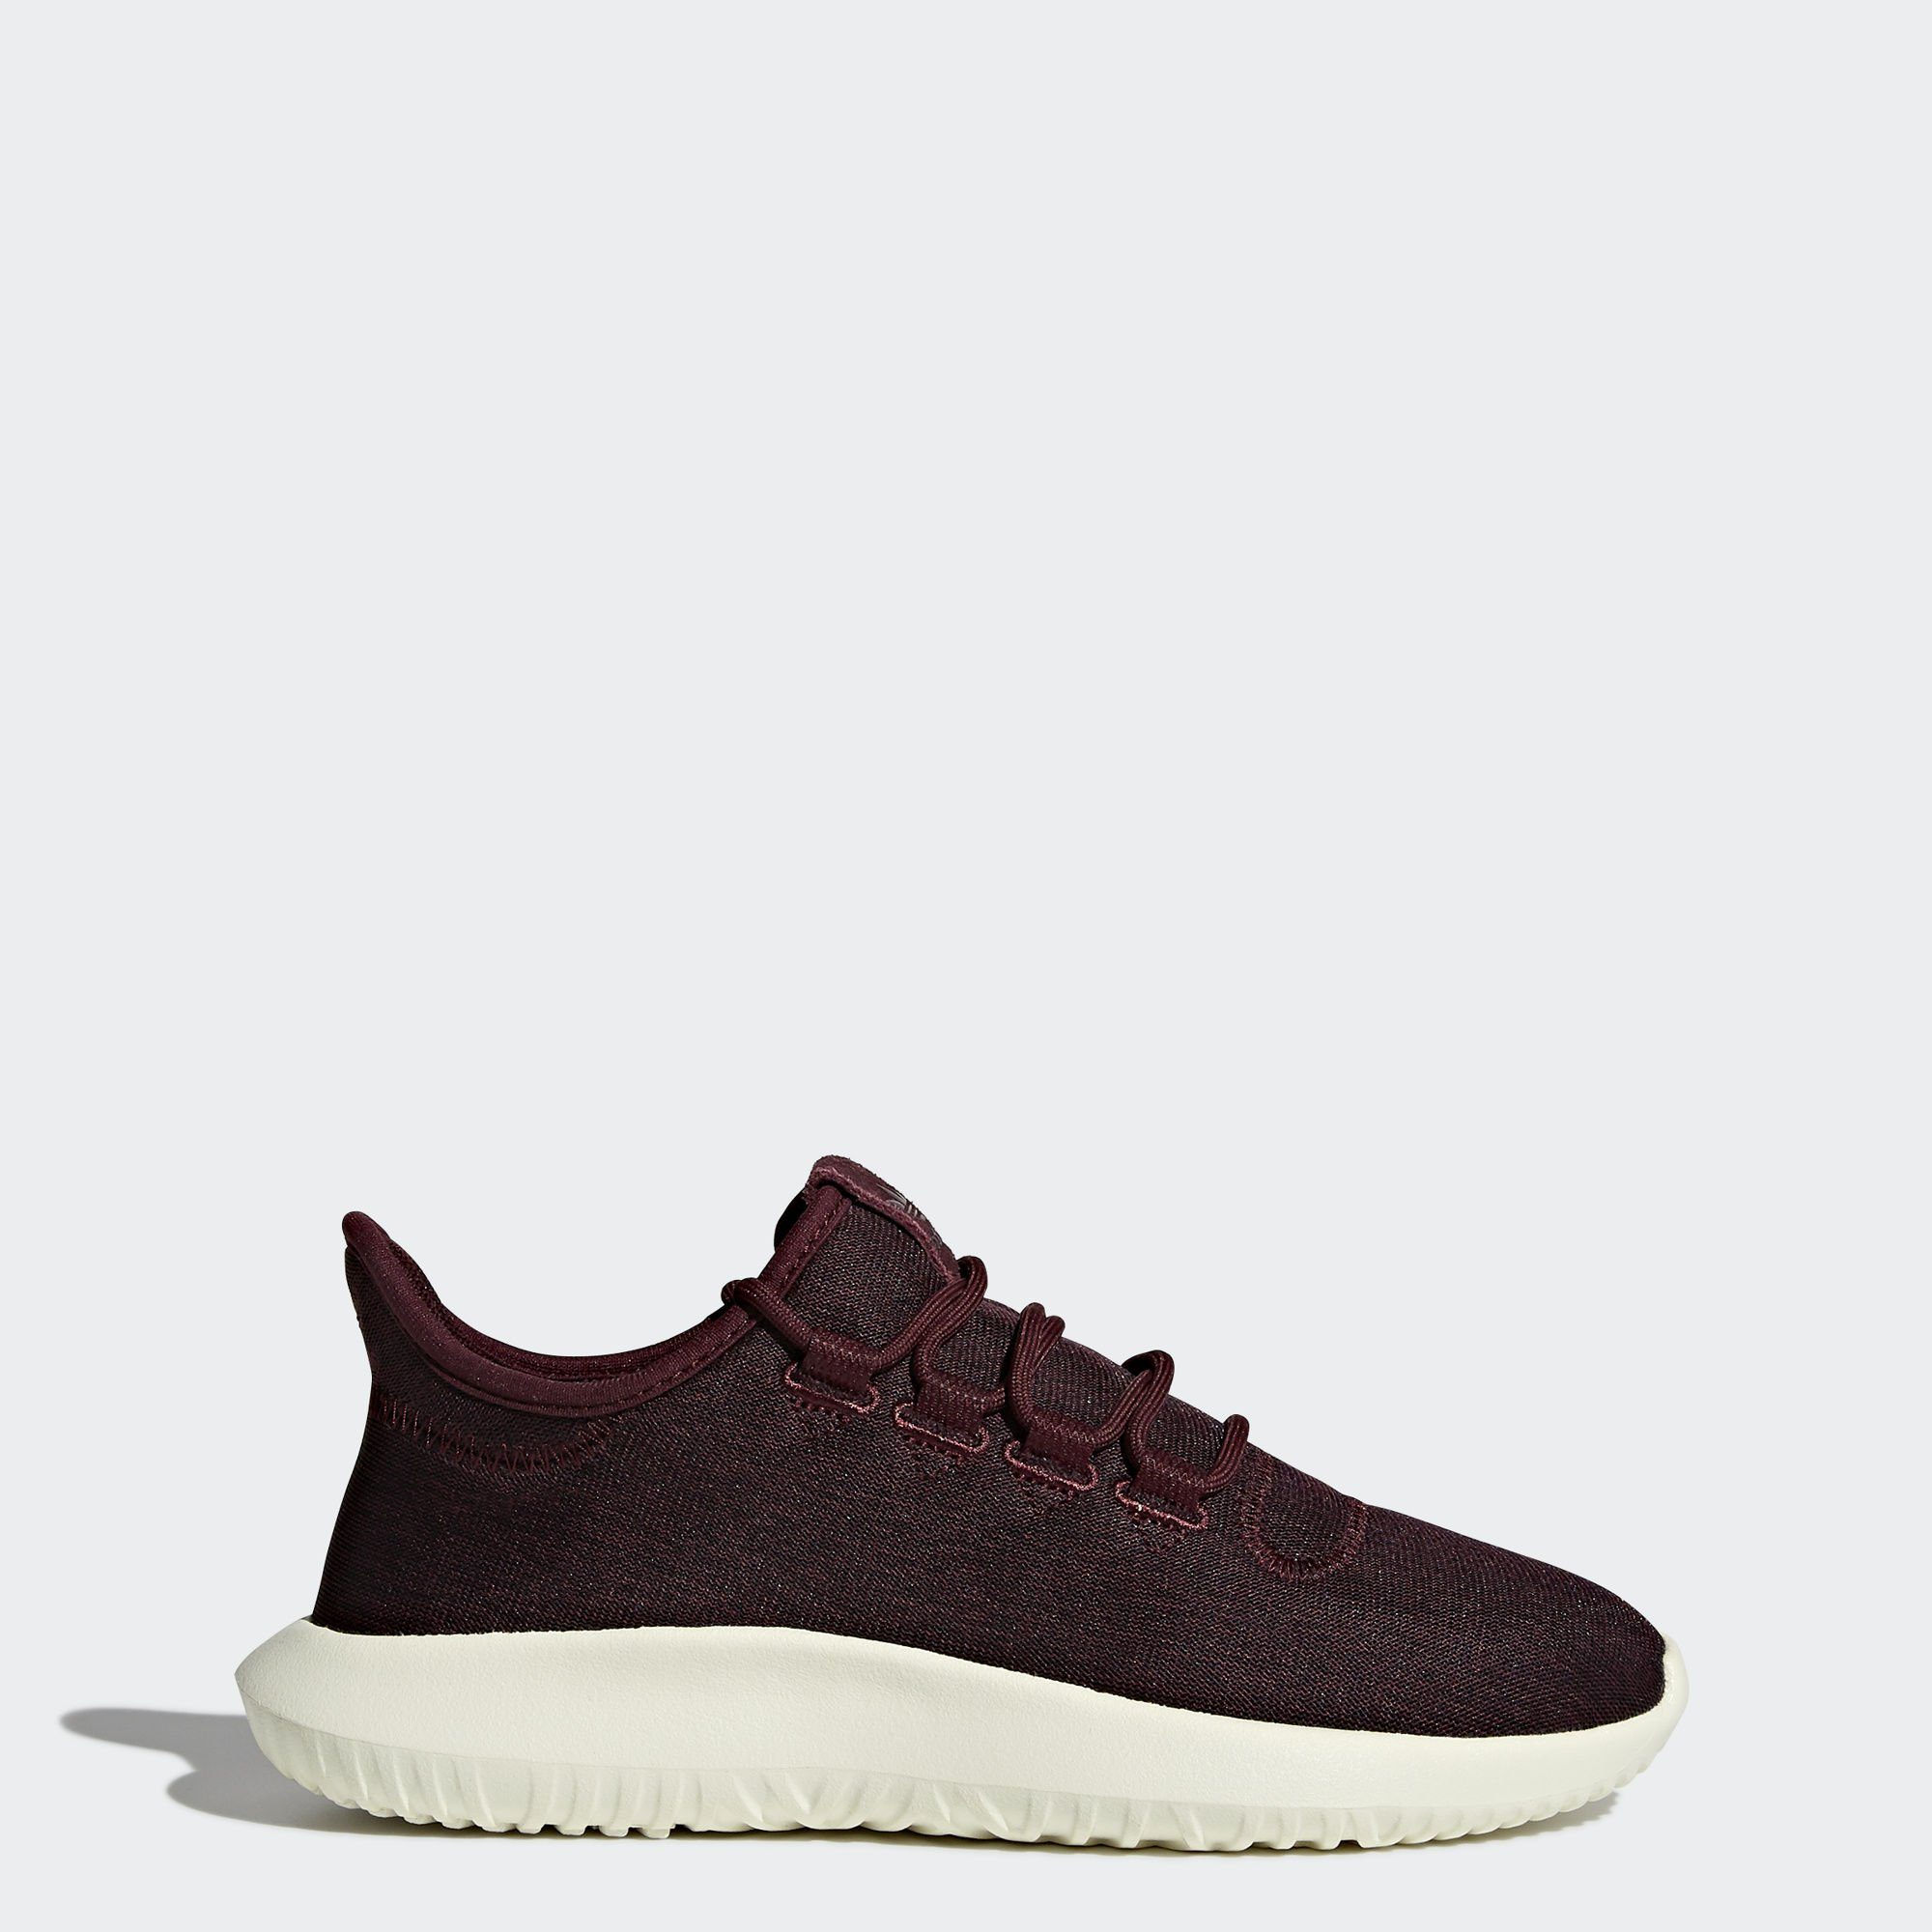 adidas Originals Tubular Shadow Schuh Sneaker  red